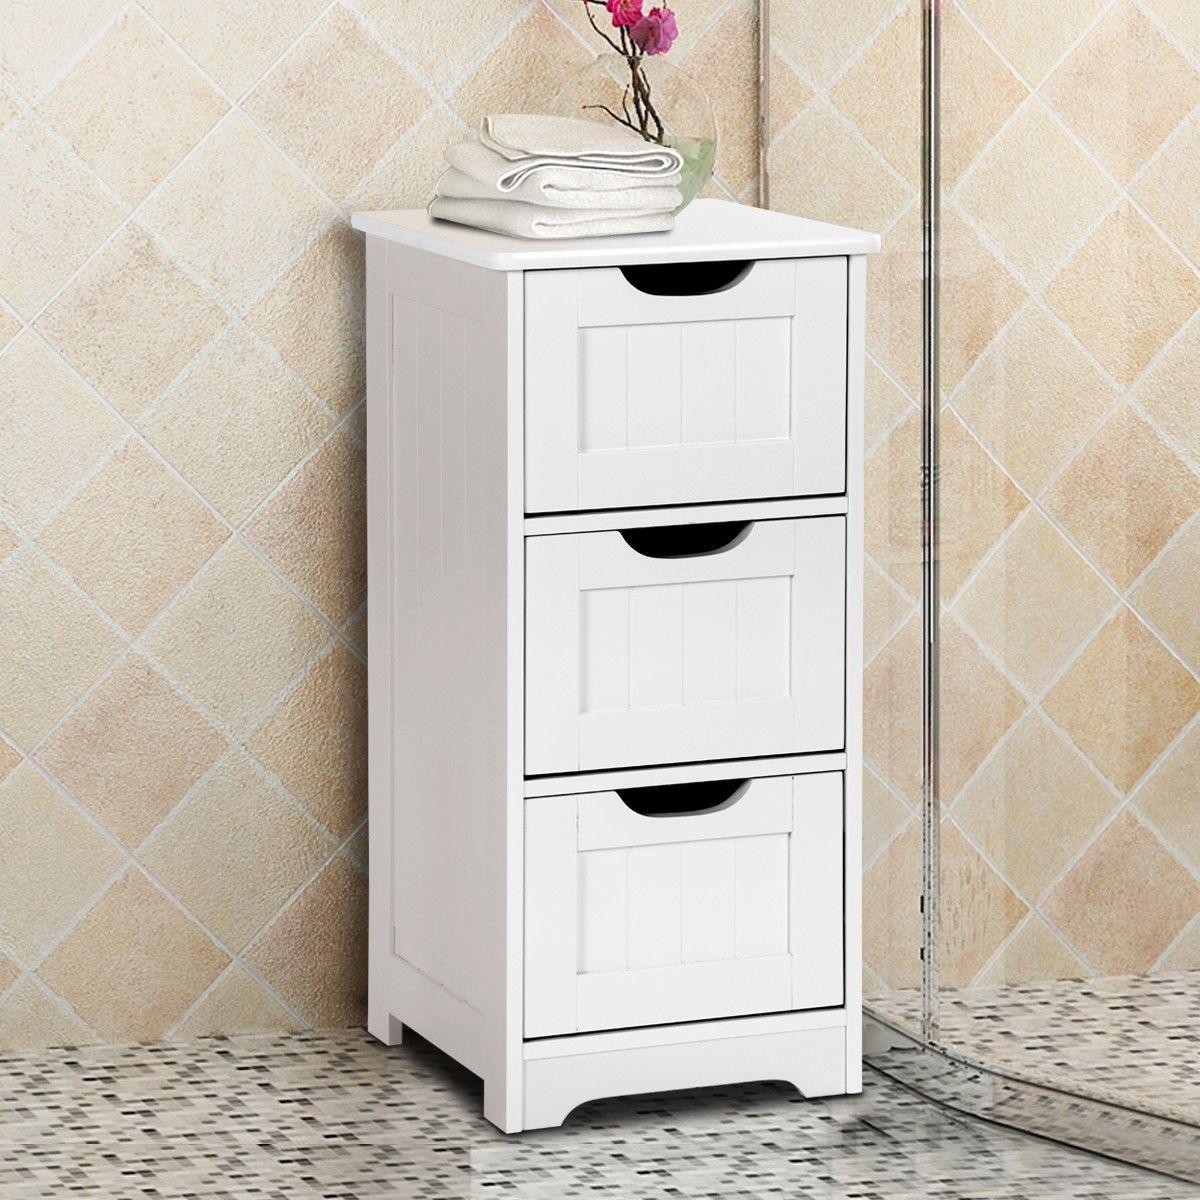 Bathroom Wooden Free Standing Storage Side Floor Cabinet Organizer Bathroom Floor Cabinets Bathroom Standing Cabinet Wooden Bathroom Storage